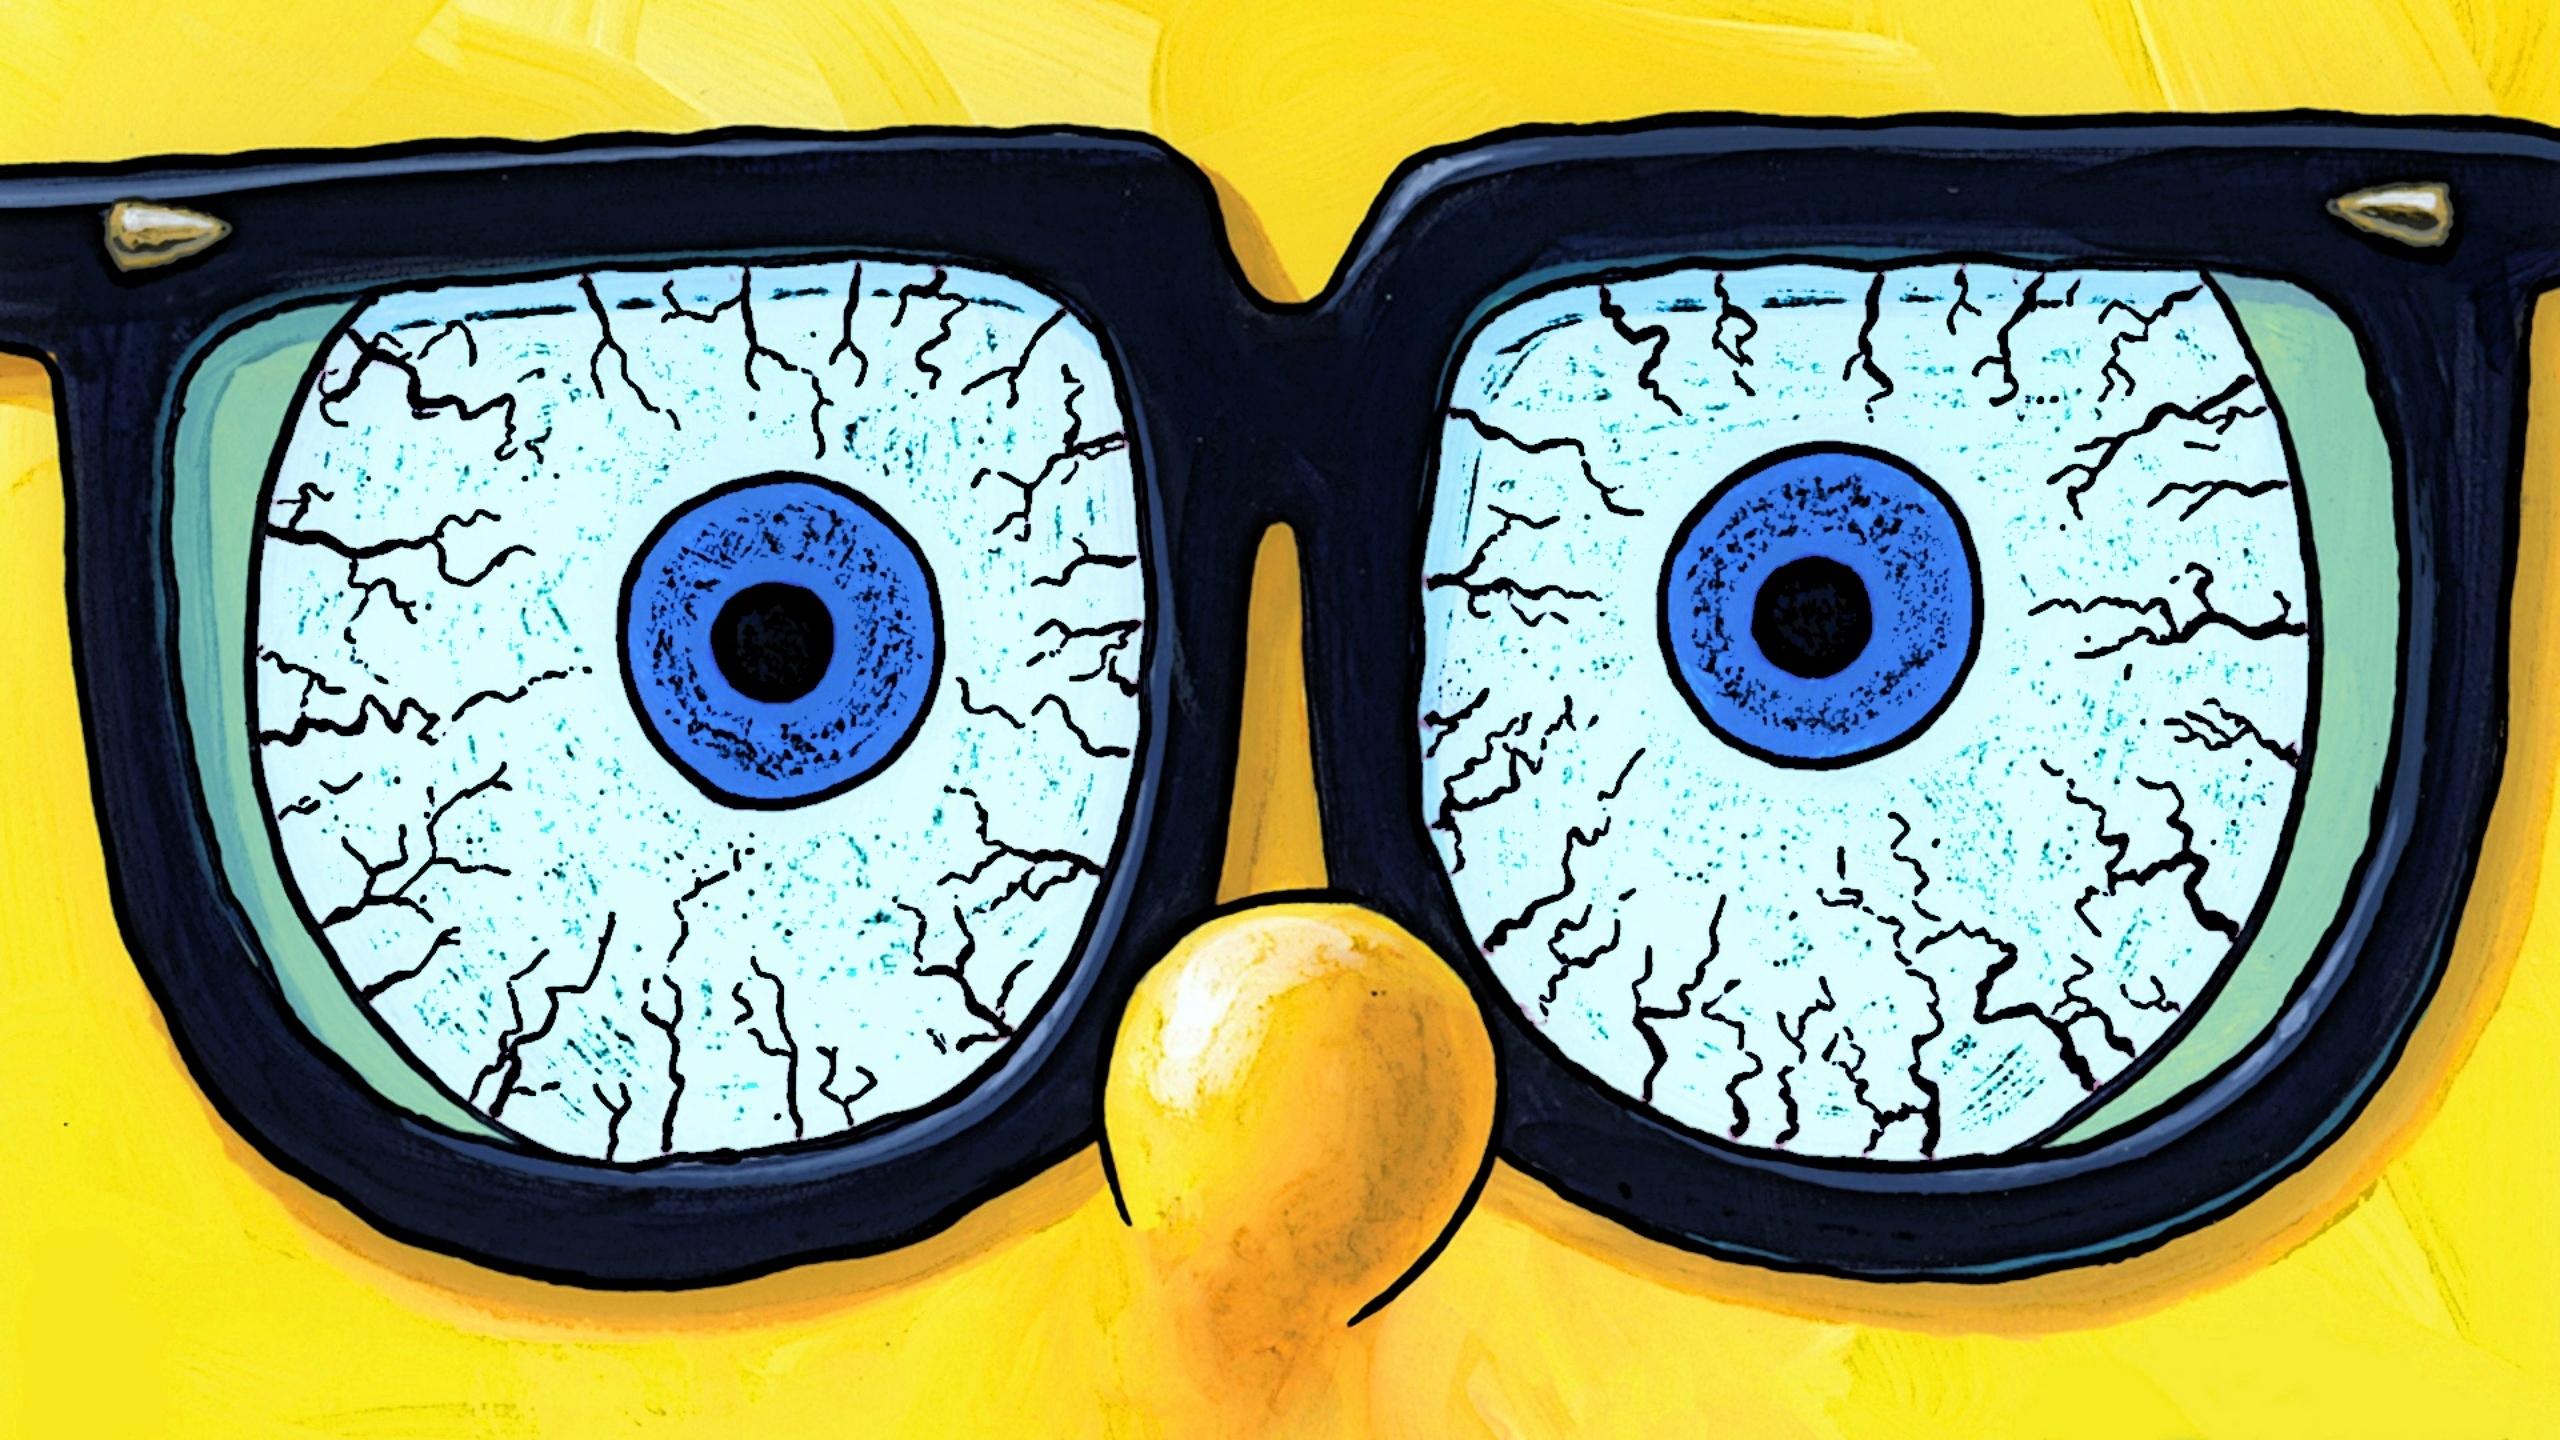 spongebob-squarepants-2.jpg